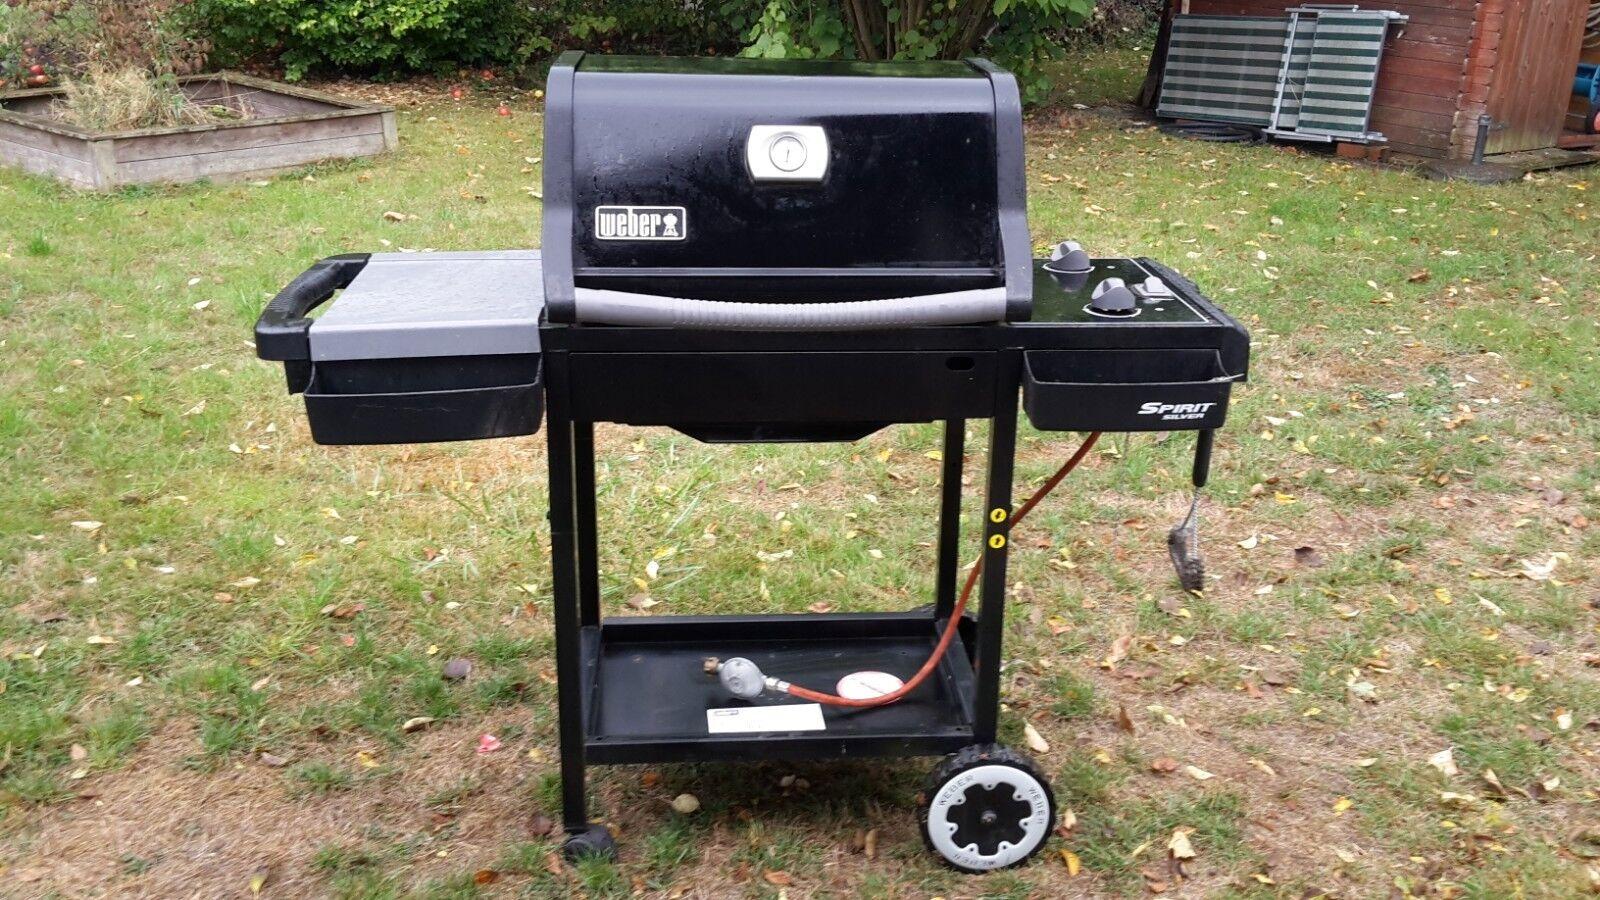 Pulled Pork På Gasgrill Q3200 : Weber grill tilbud q weber q gasgrill sammenlign priser hos